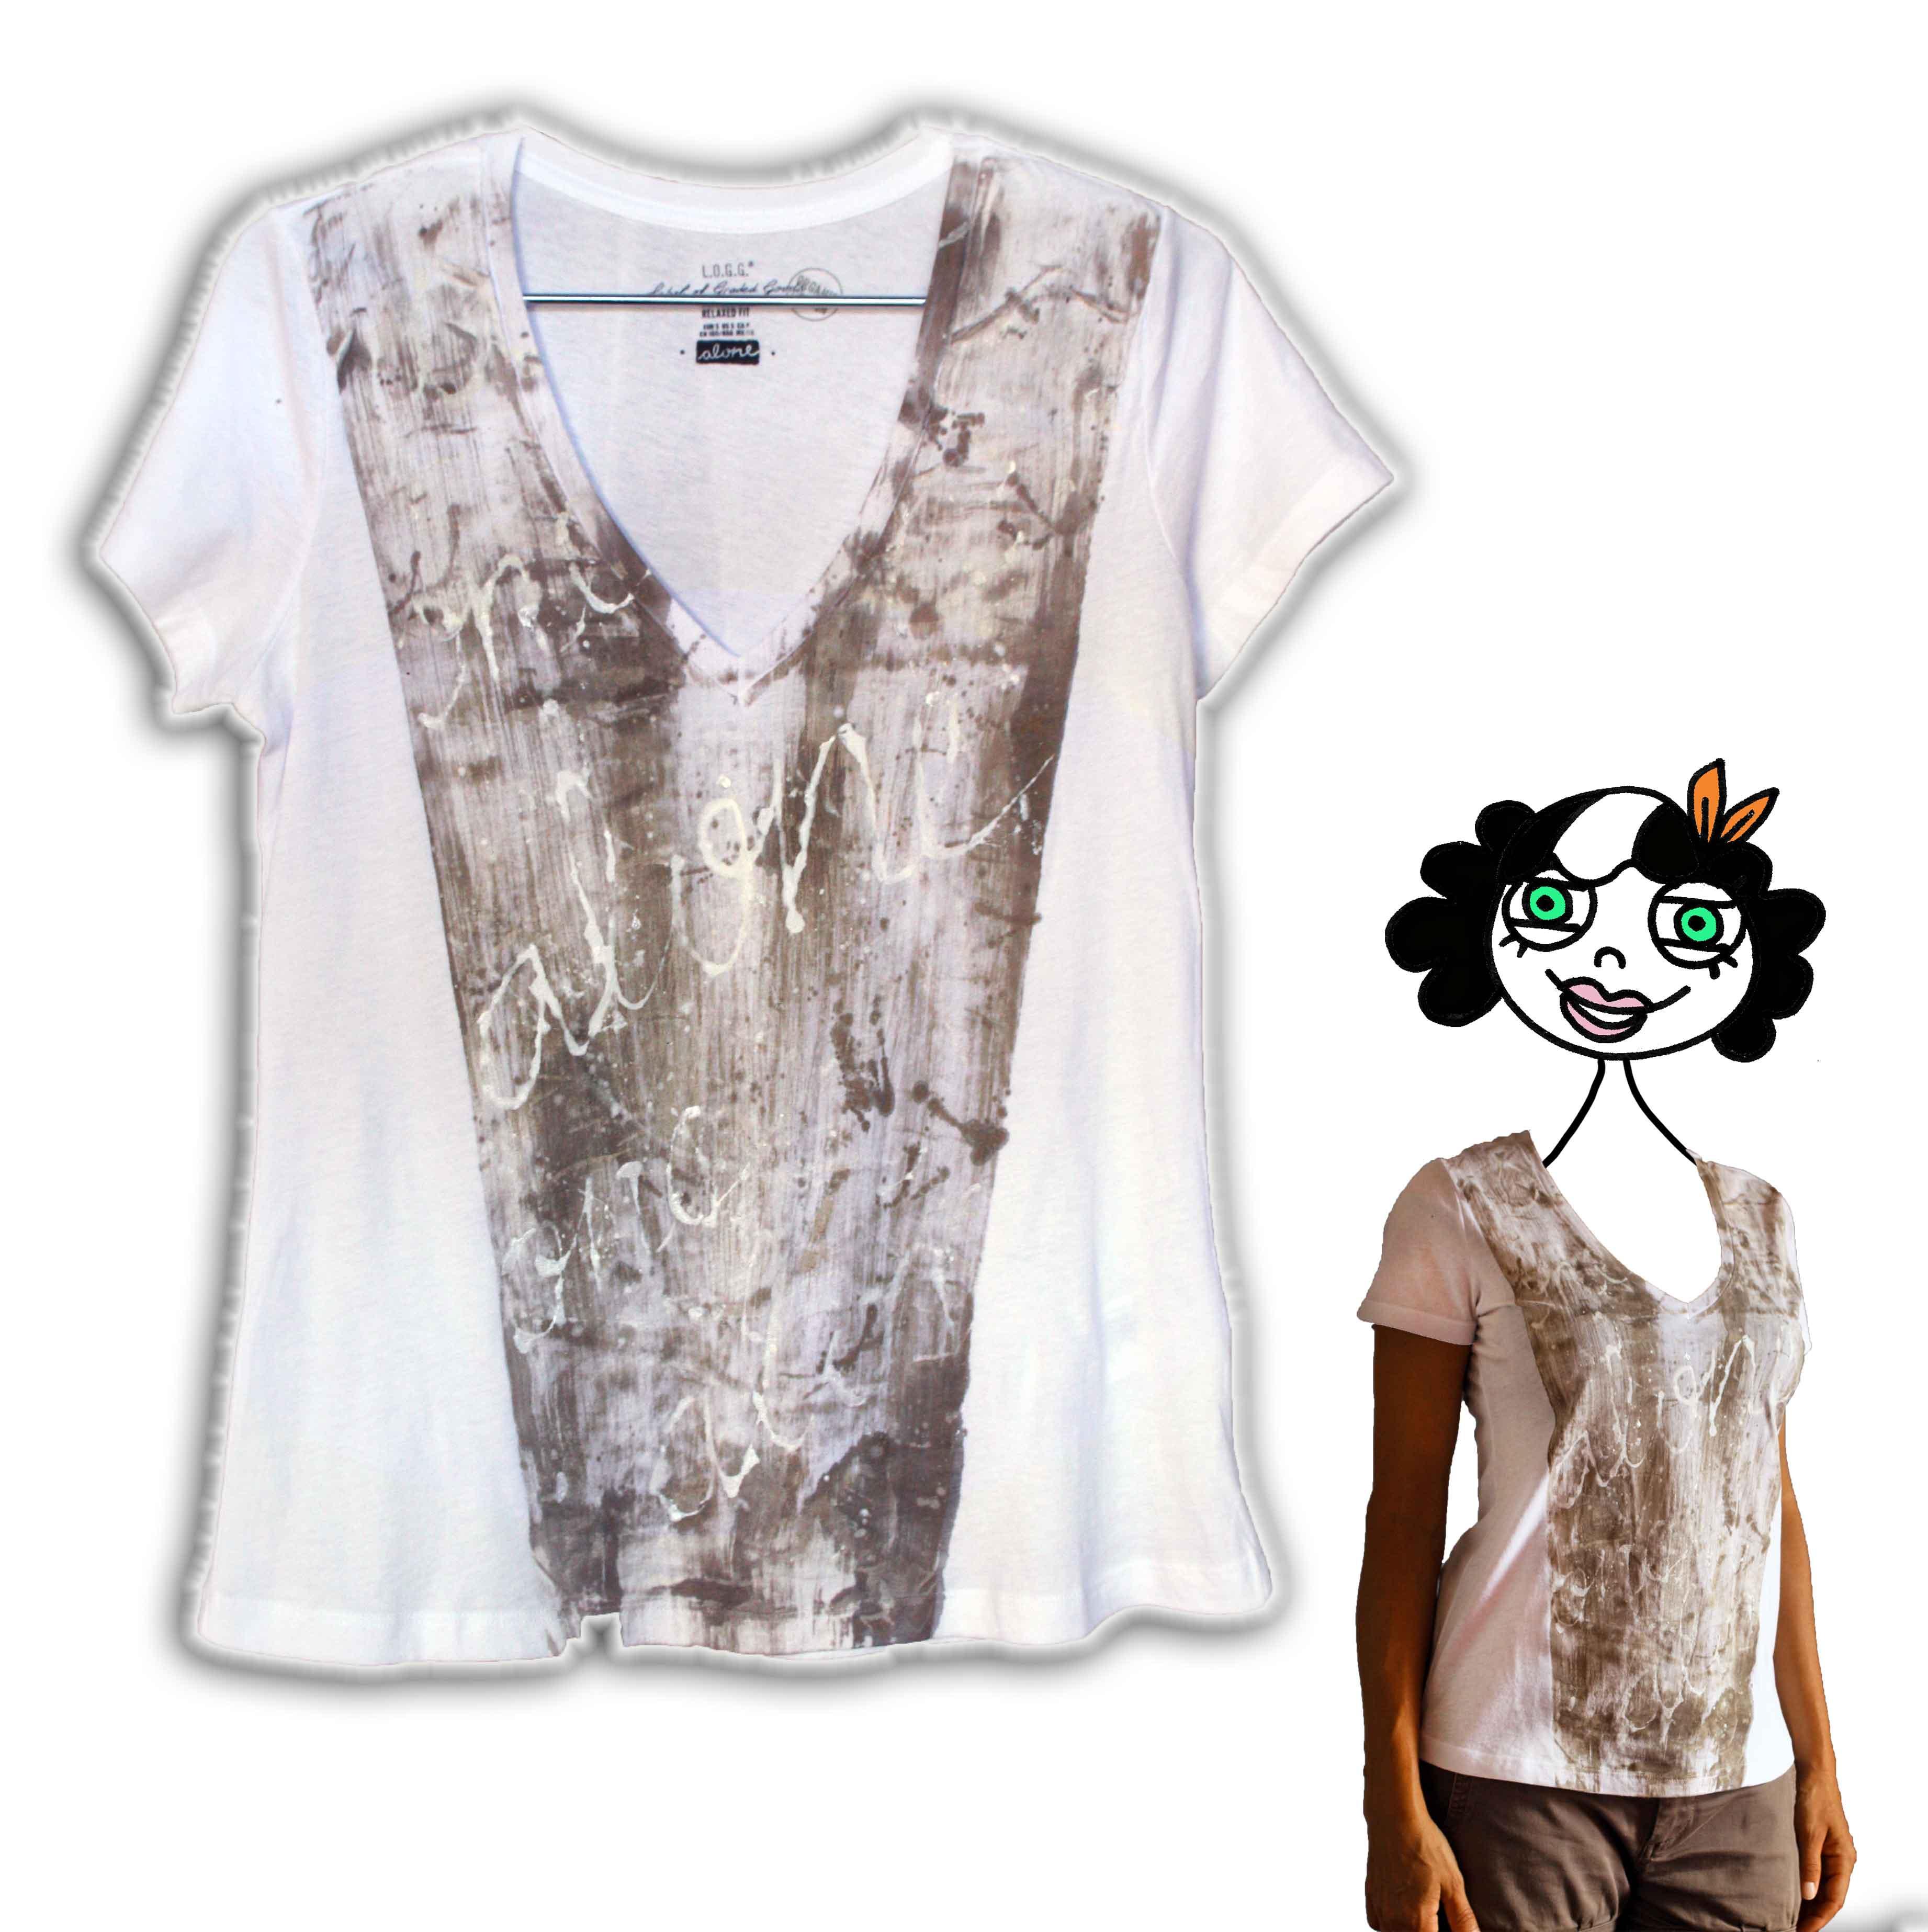 dipinto a mano su t-shirt